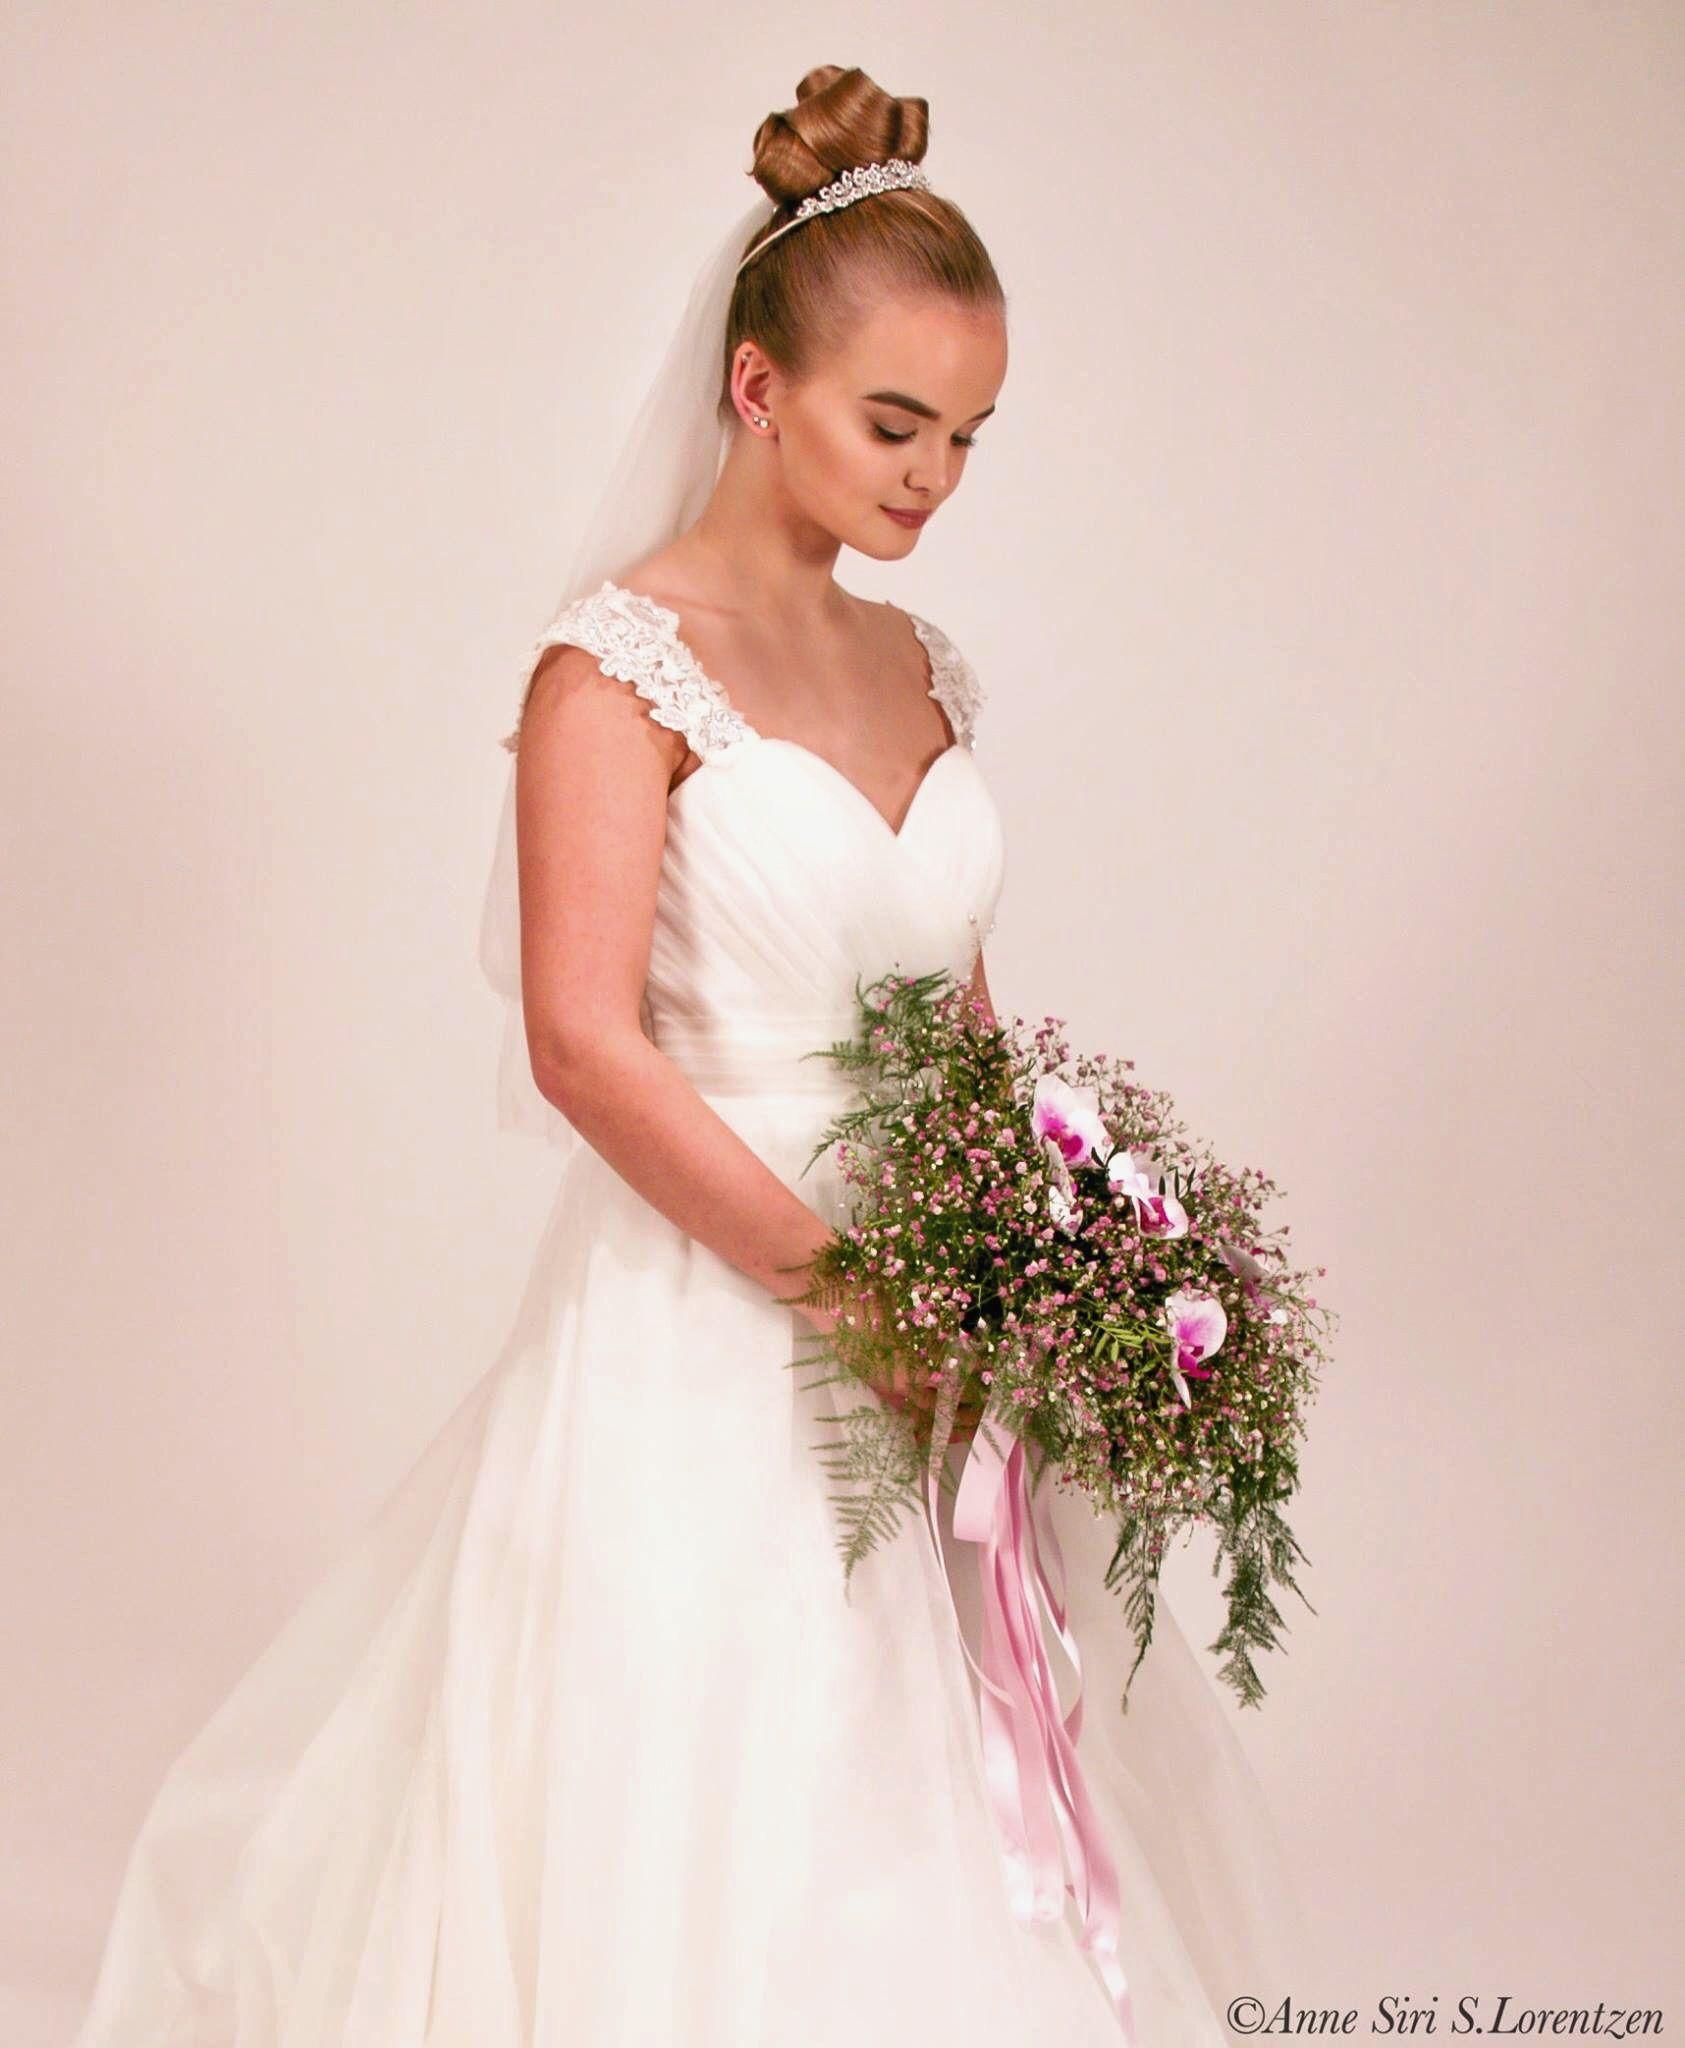 Bride fashion dresses and hair #bride #weddingdress #hair #hairinspo